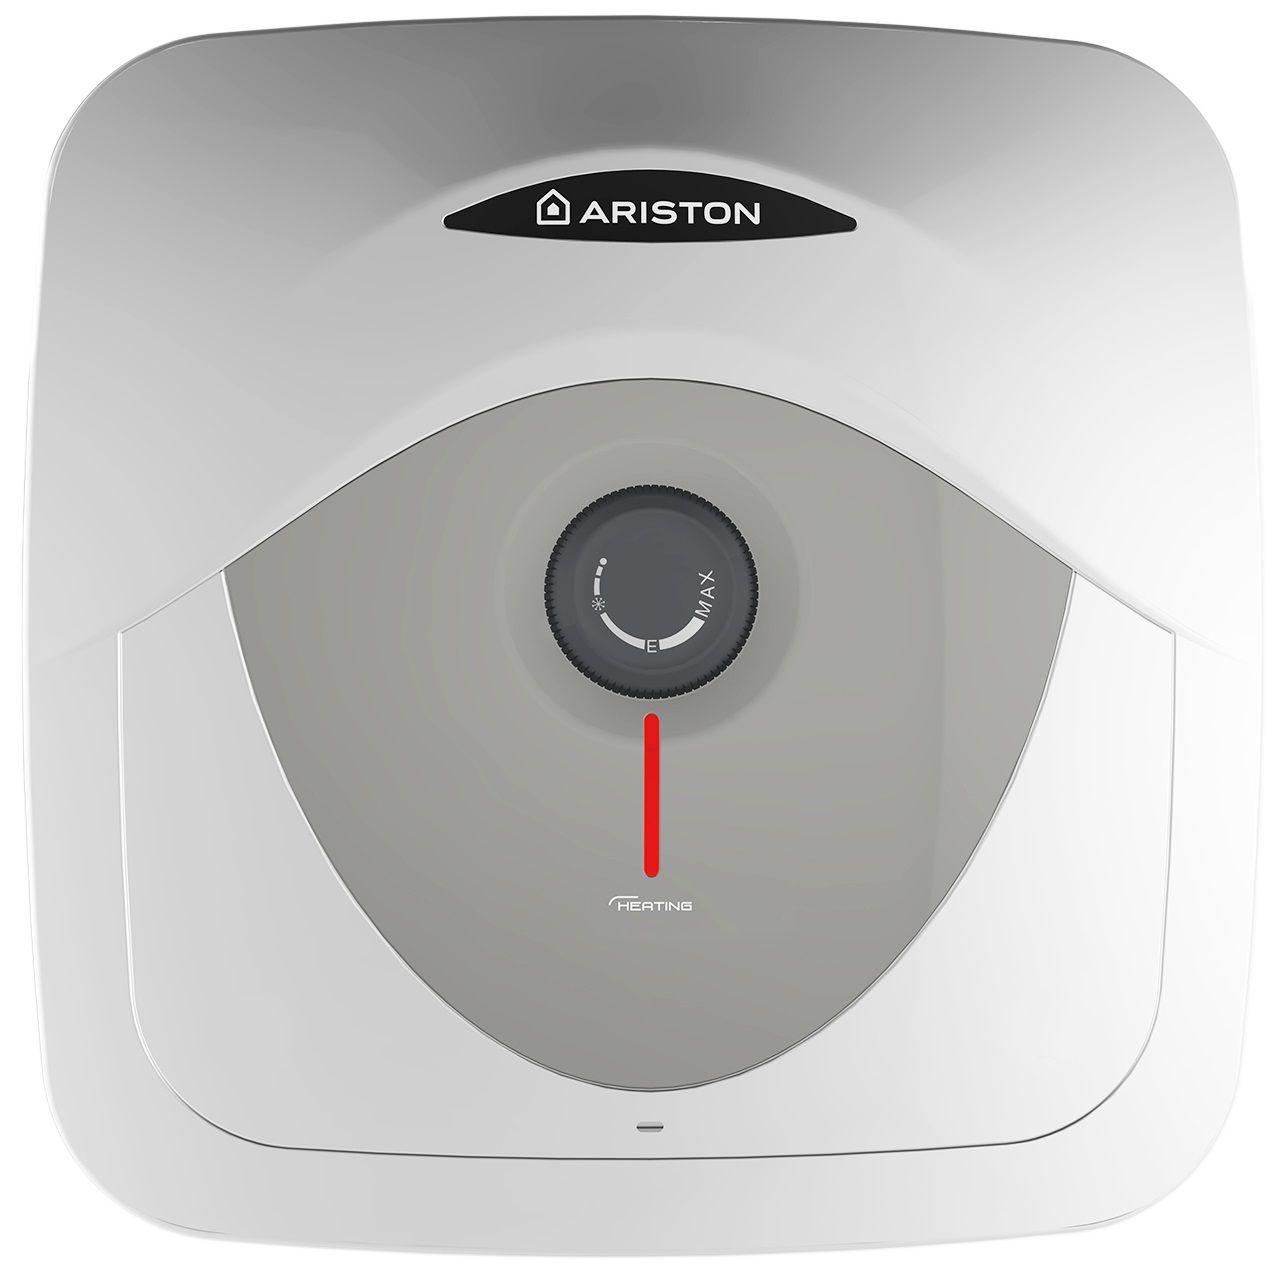 Boiler electric Ariston Andris RS 15 EU, 15 l, 1200 W, Led iluminat, Protectie electrica IPX1, Montare deasupra chiuvetei, Reglaj extern de temperatura imagine fornello.ro